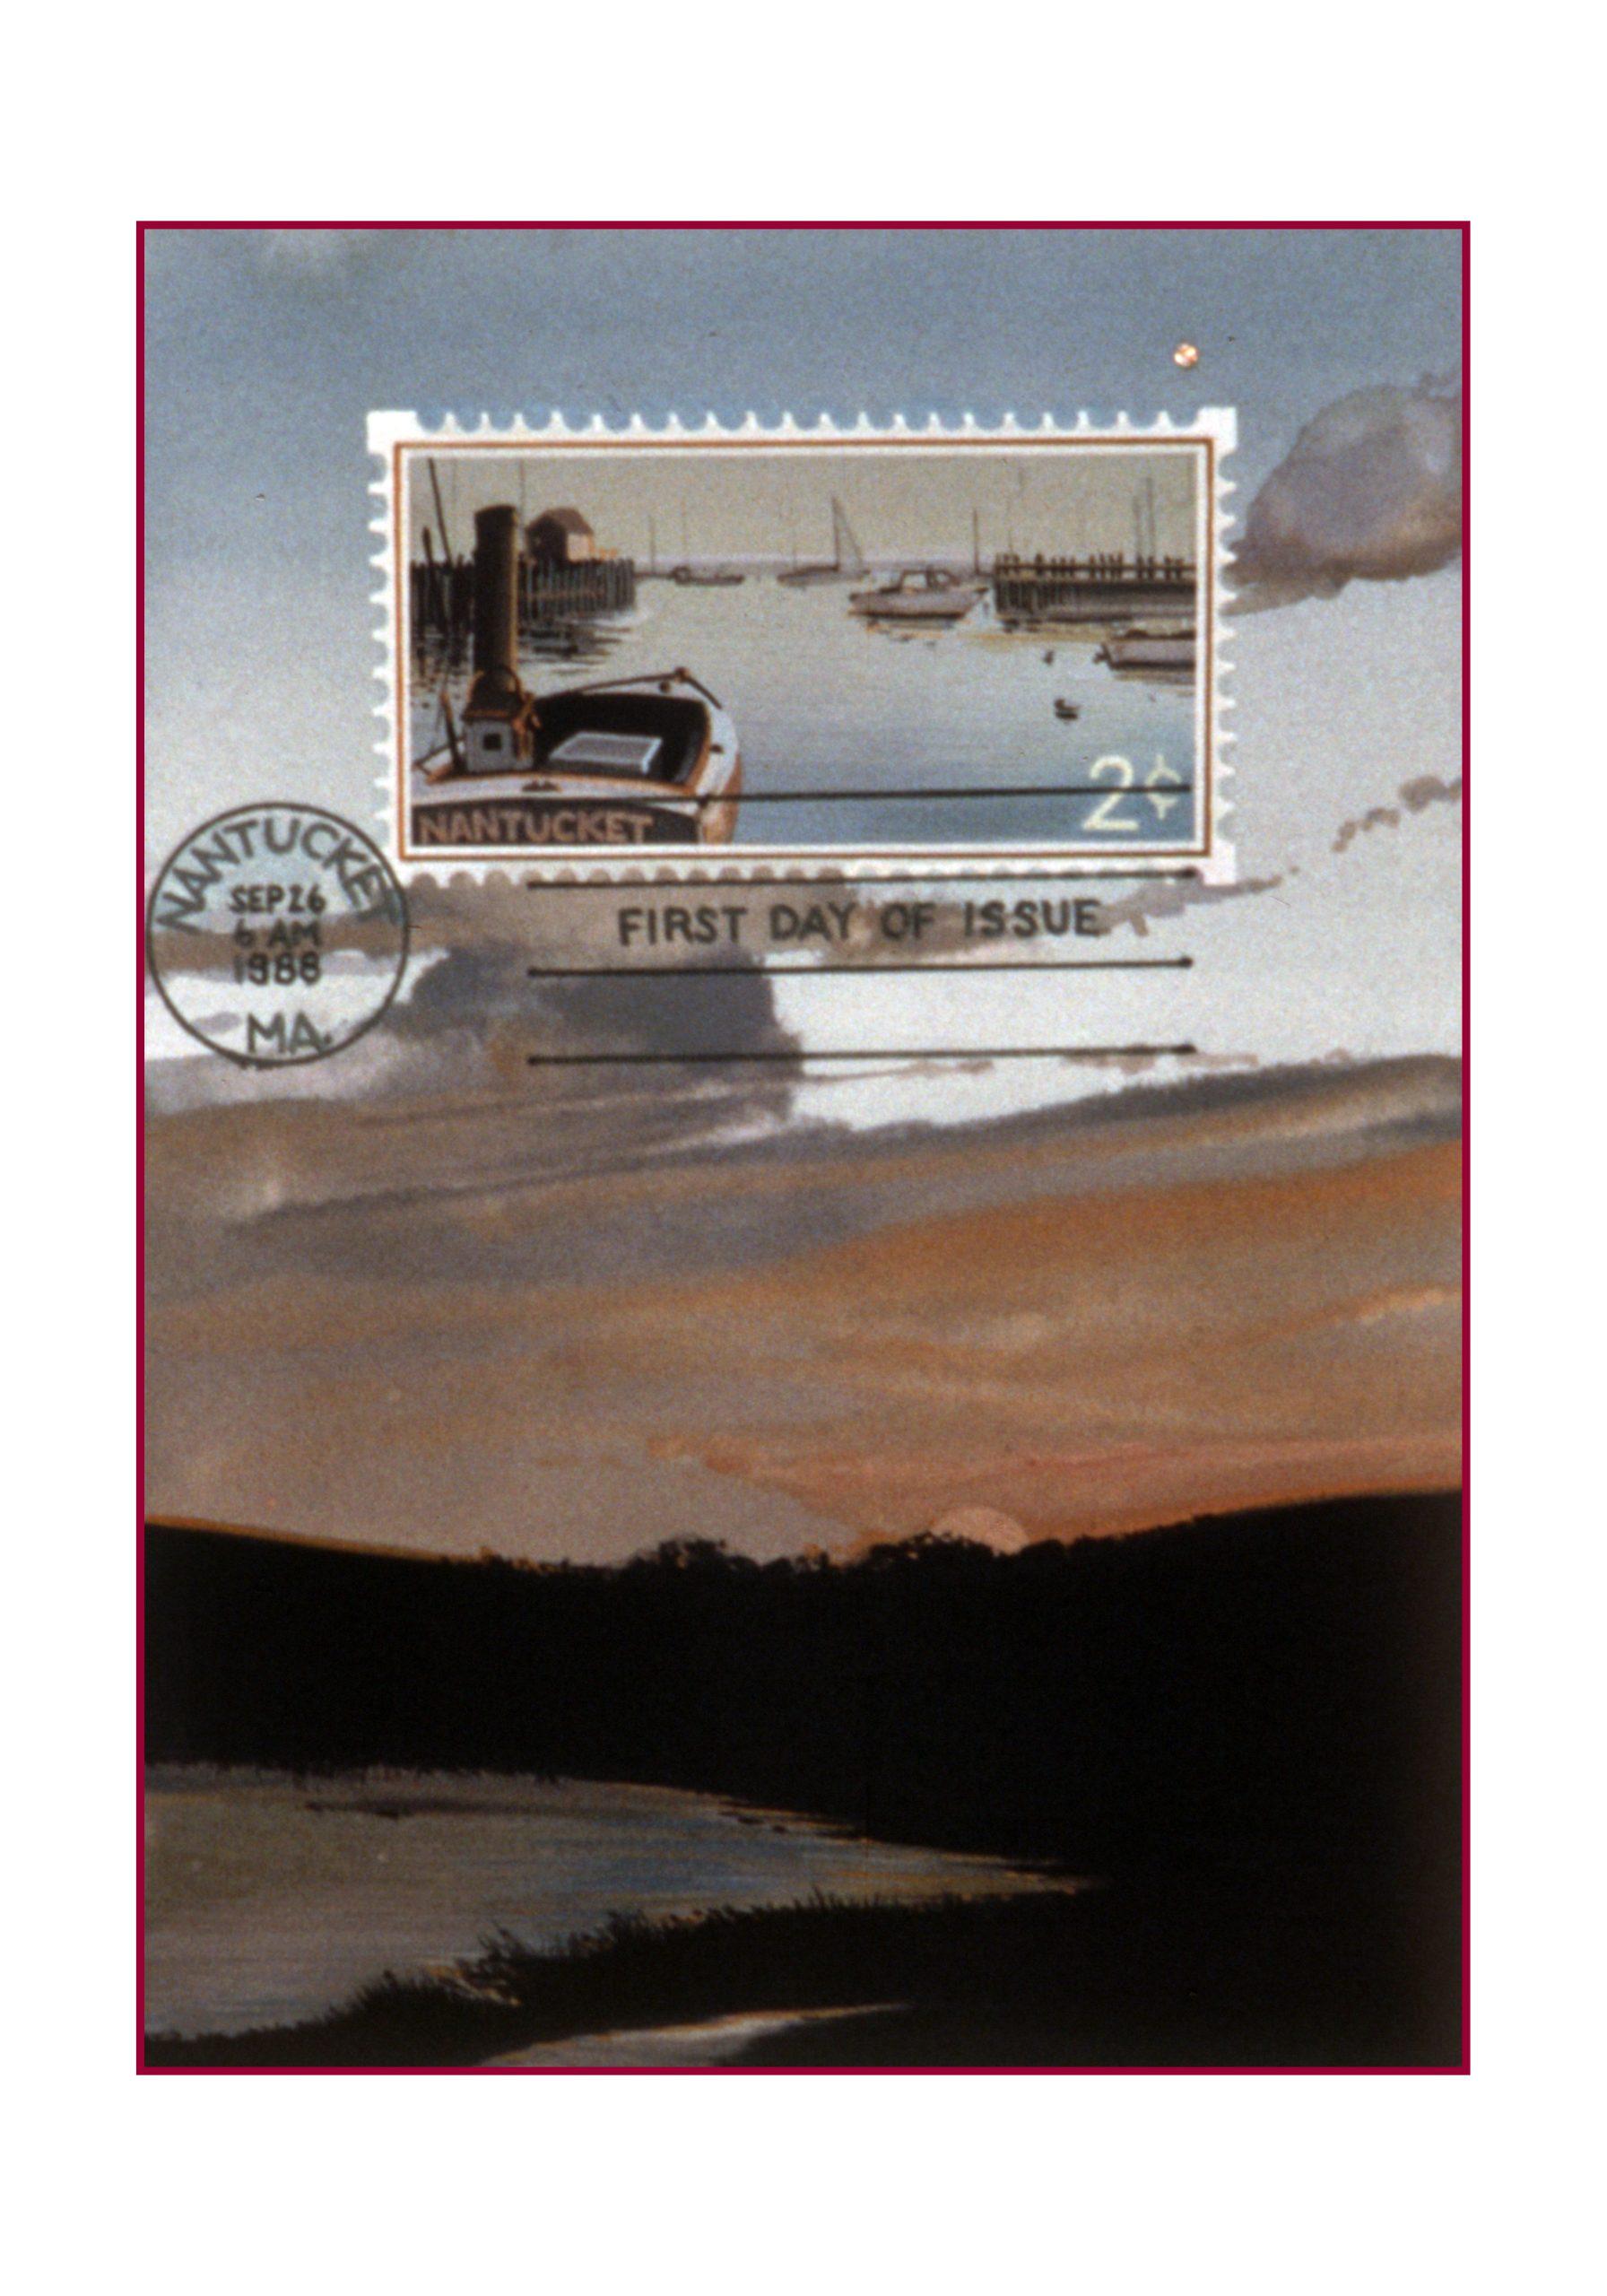 Island Postage, gouache 7inX5in 1990